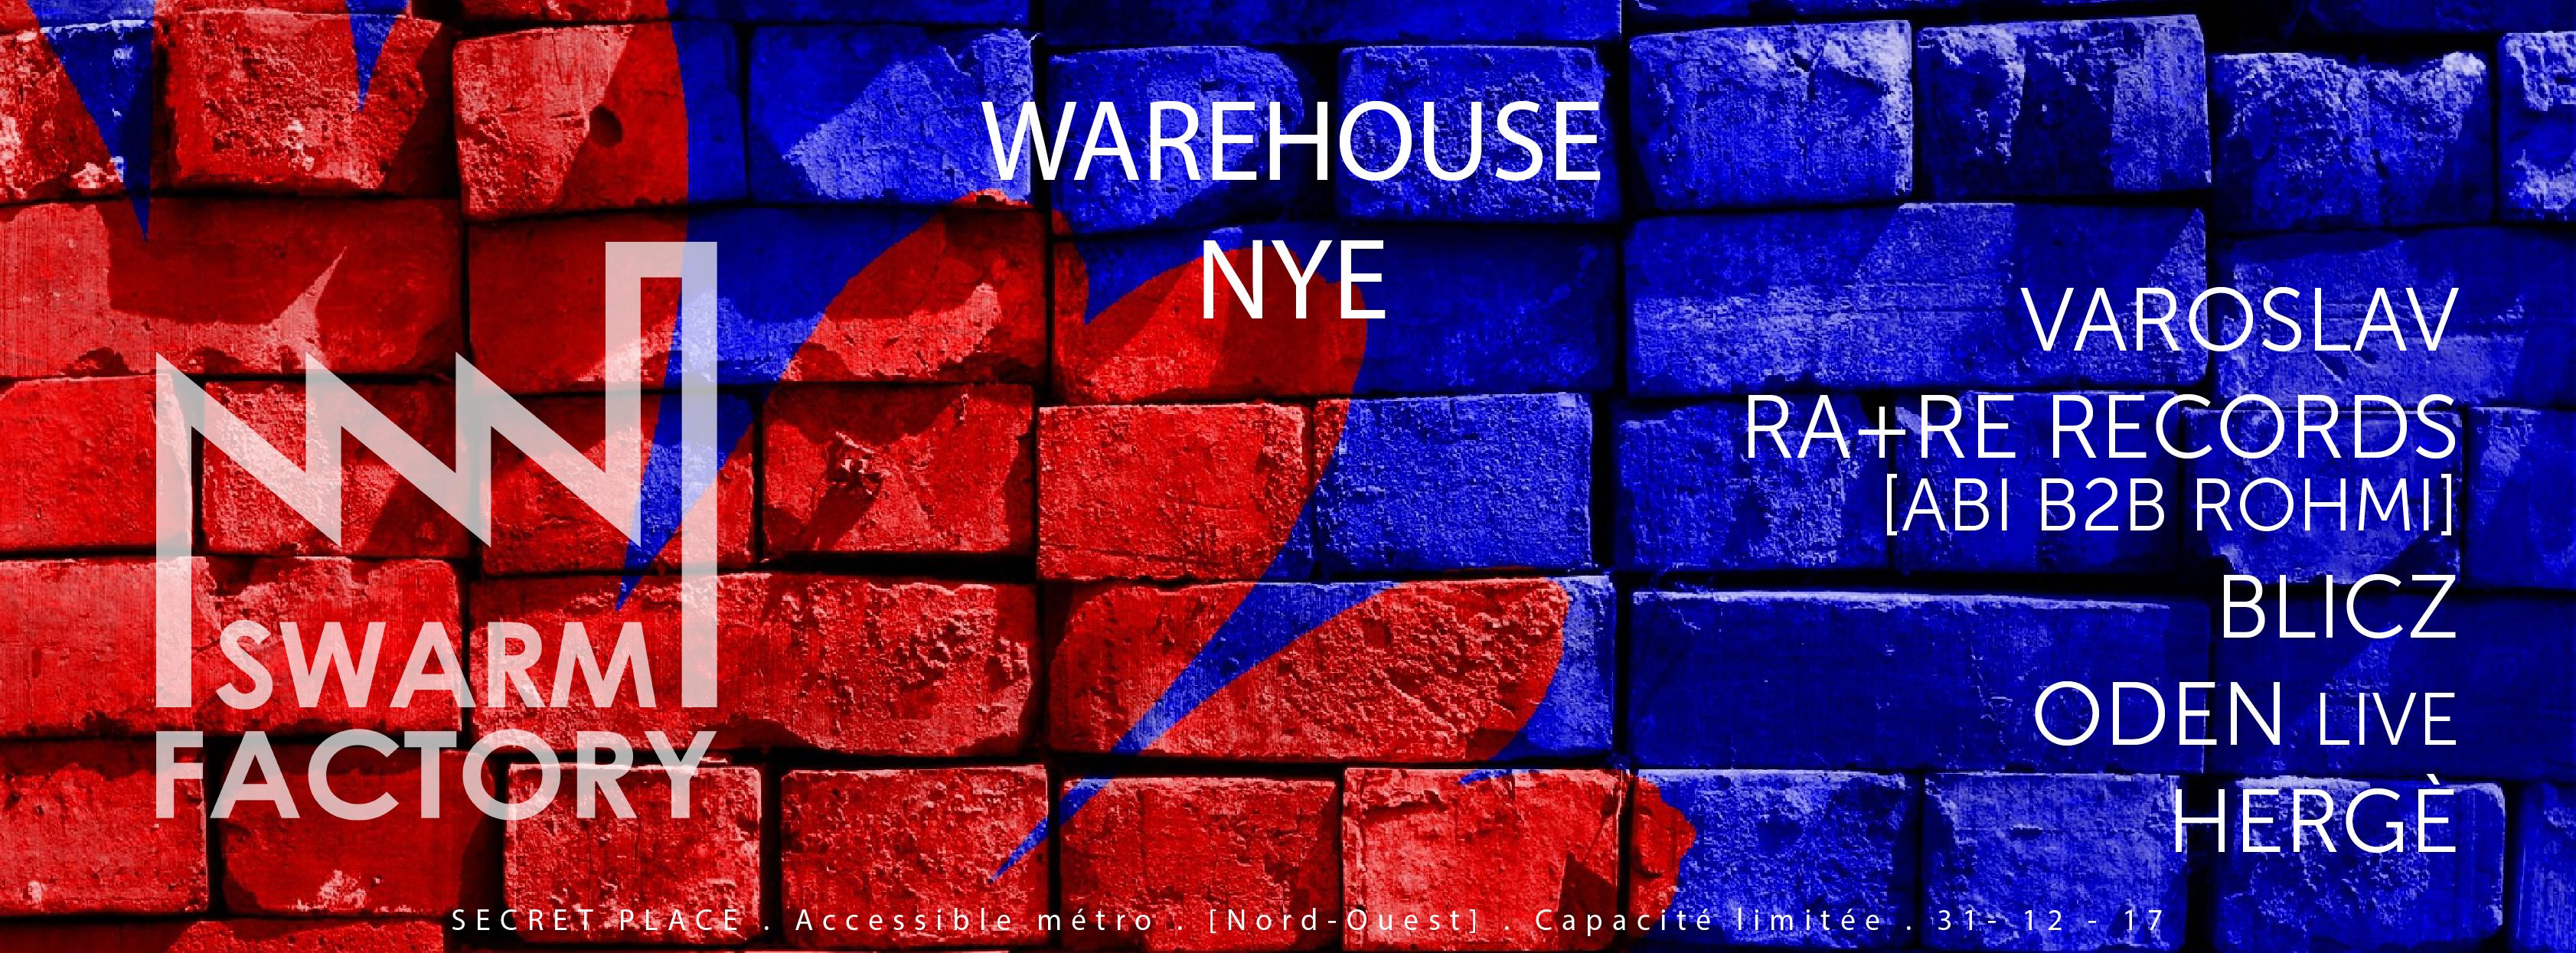 Swarm Factory NYE Warehouse 4th Birthday: Varoslav, RA+RE & More